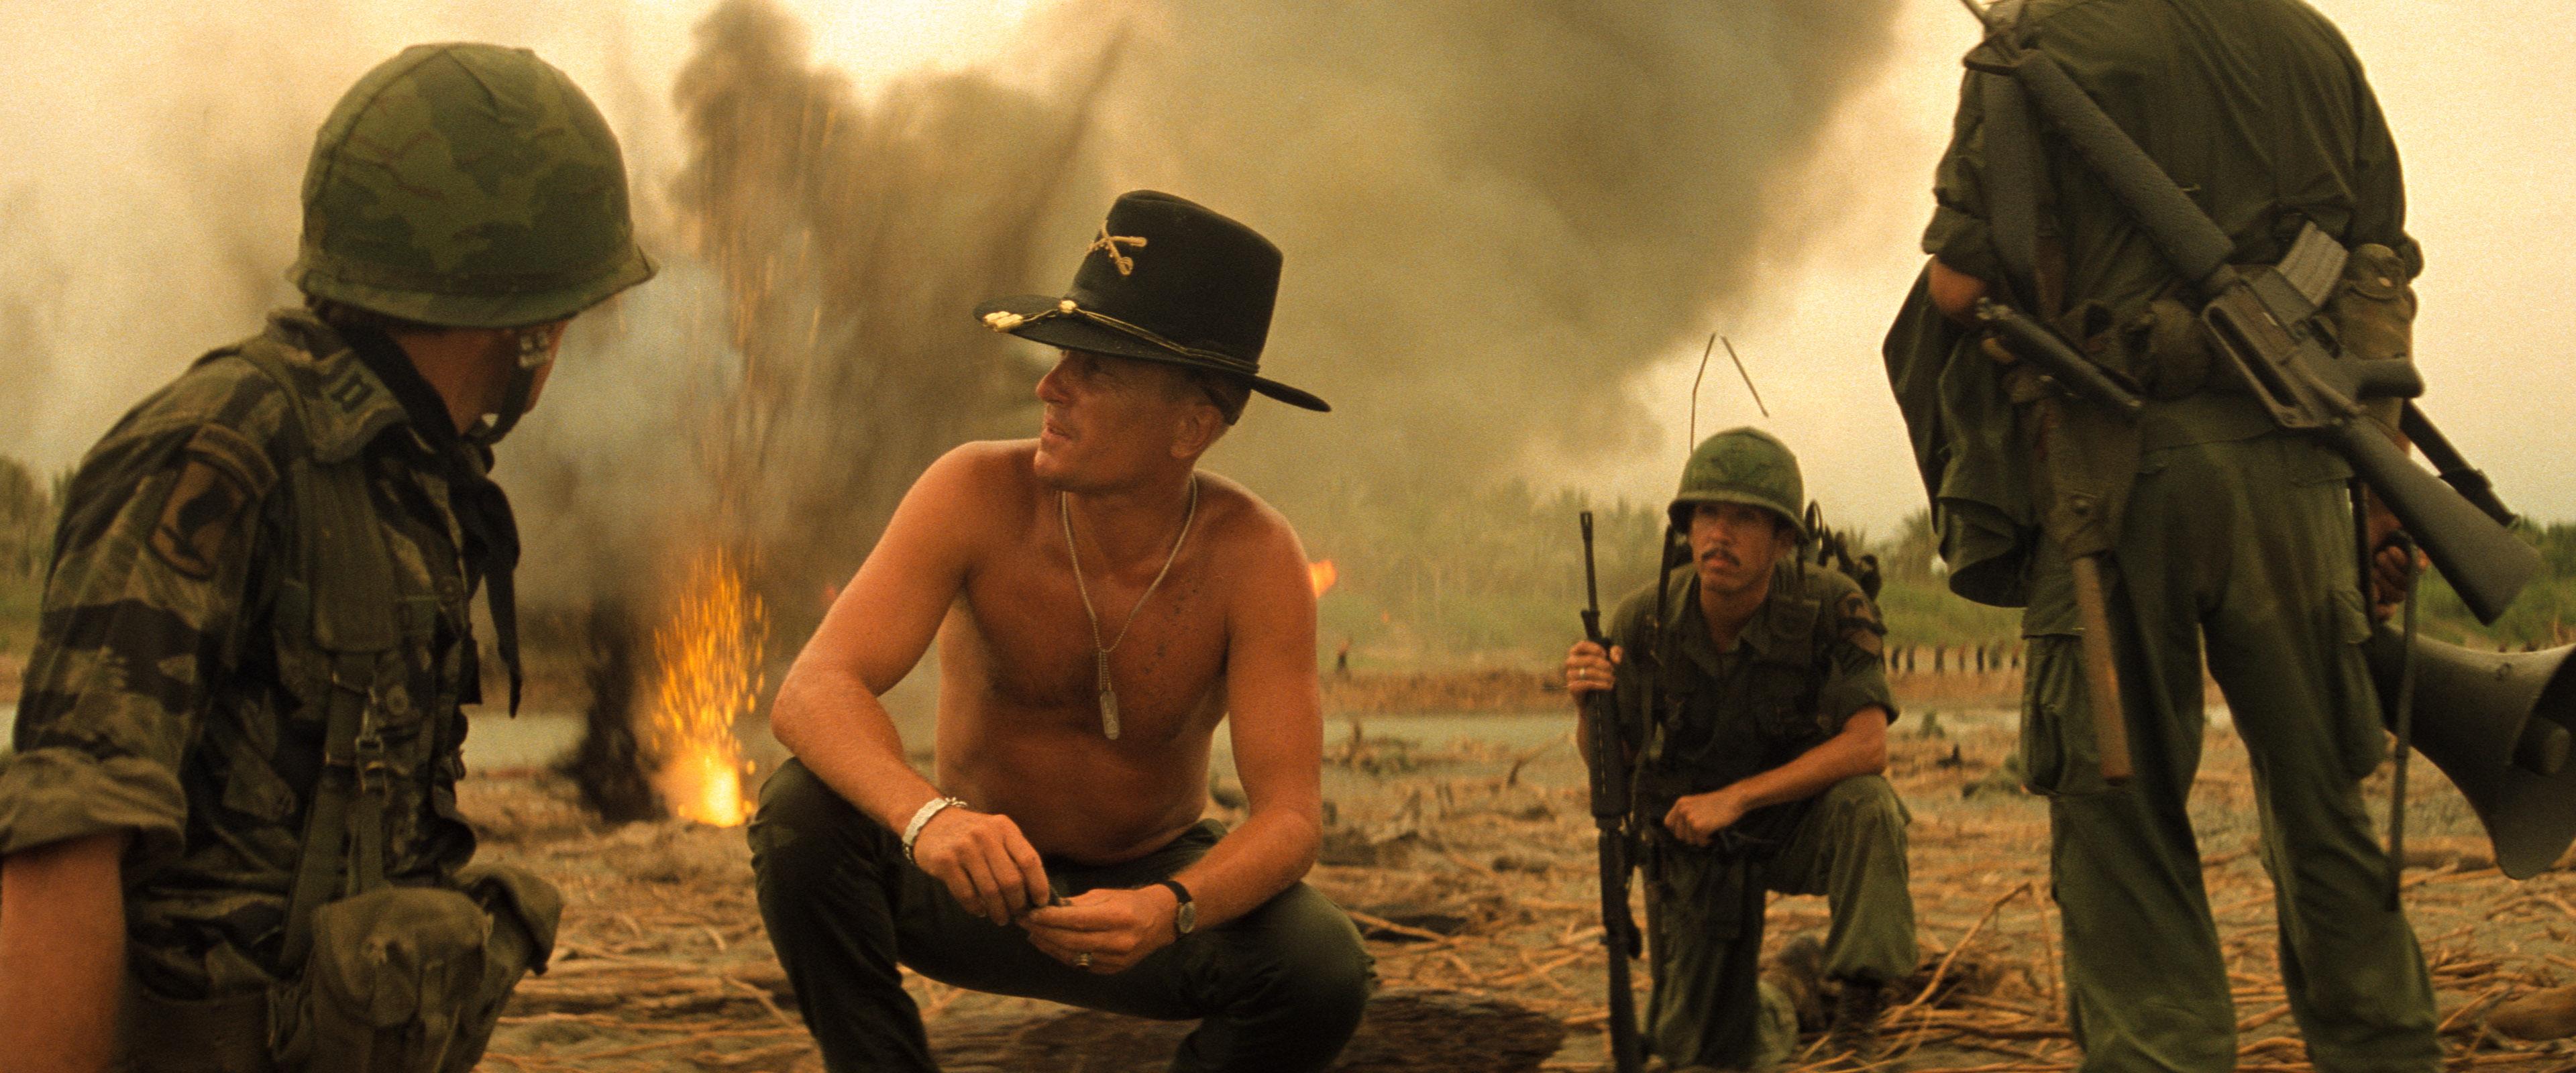 apocalypse_now_filme